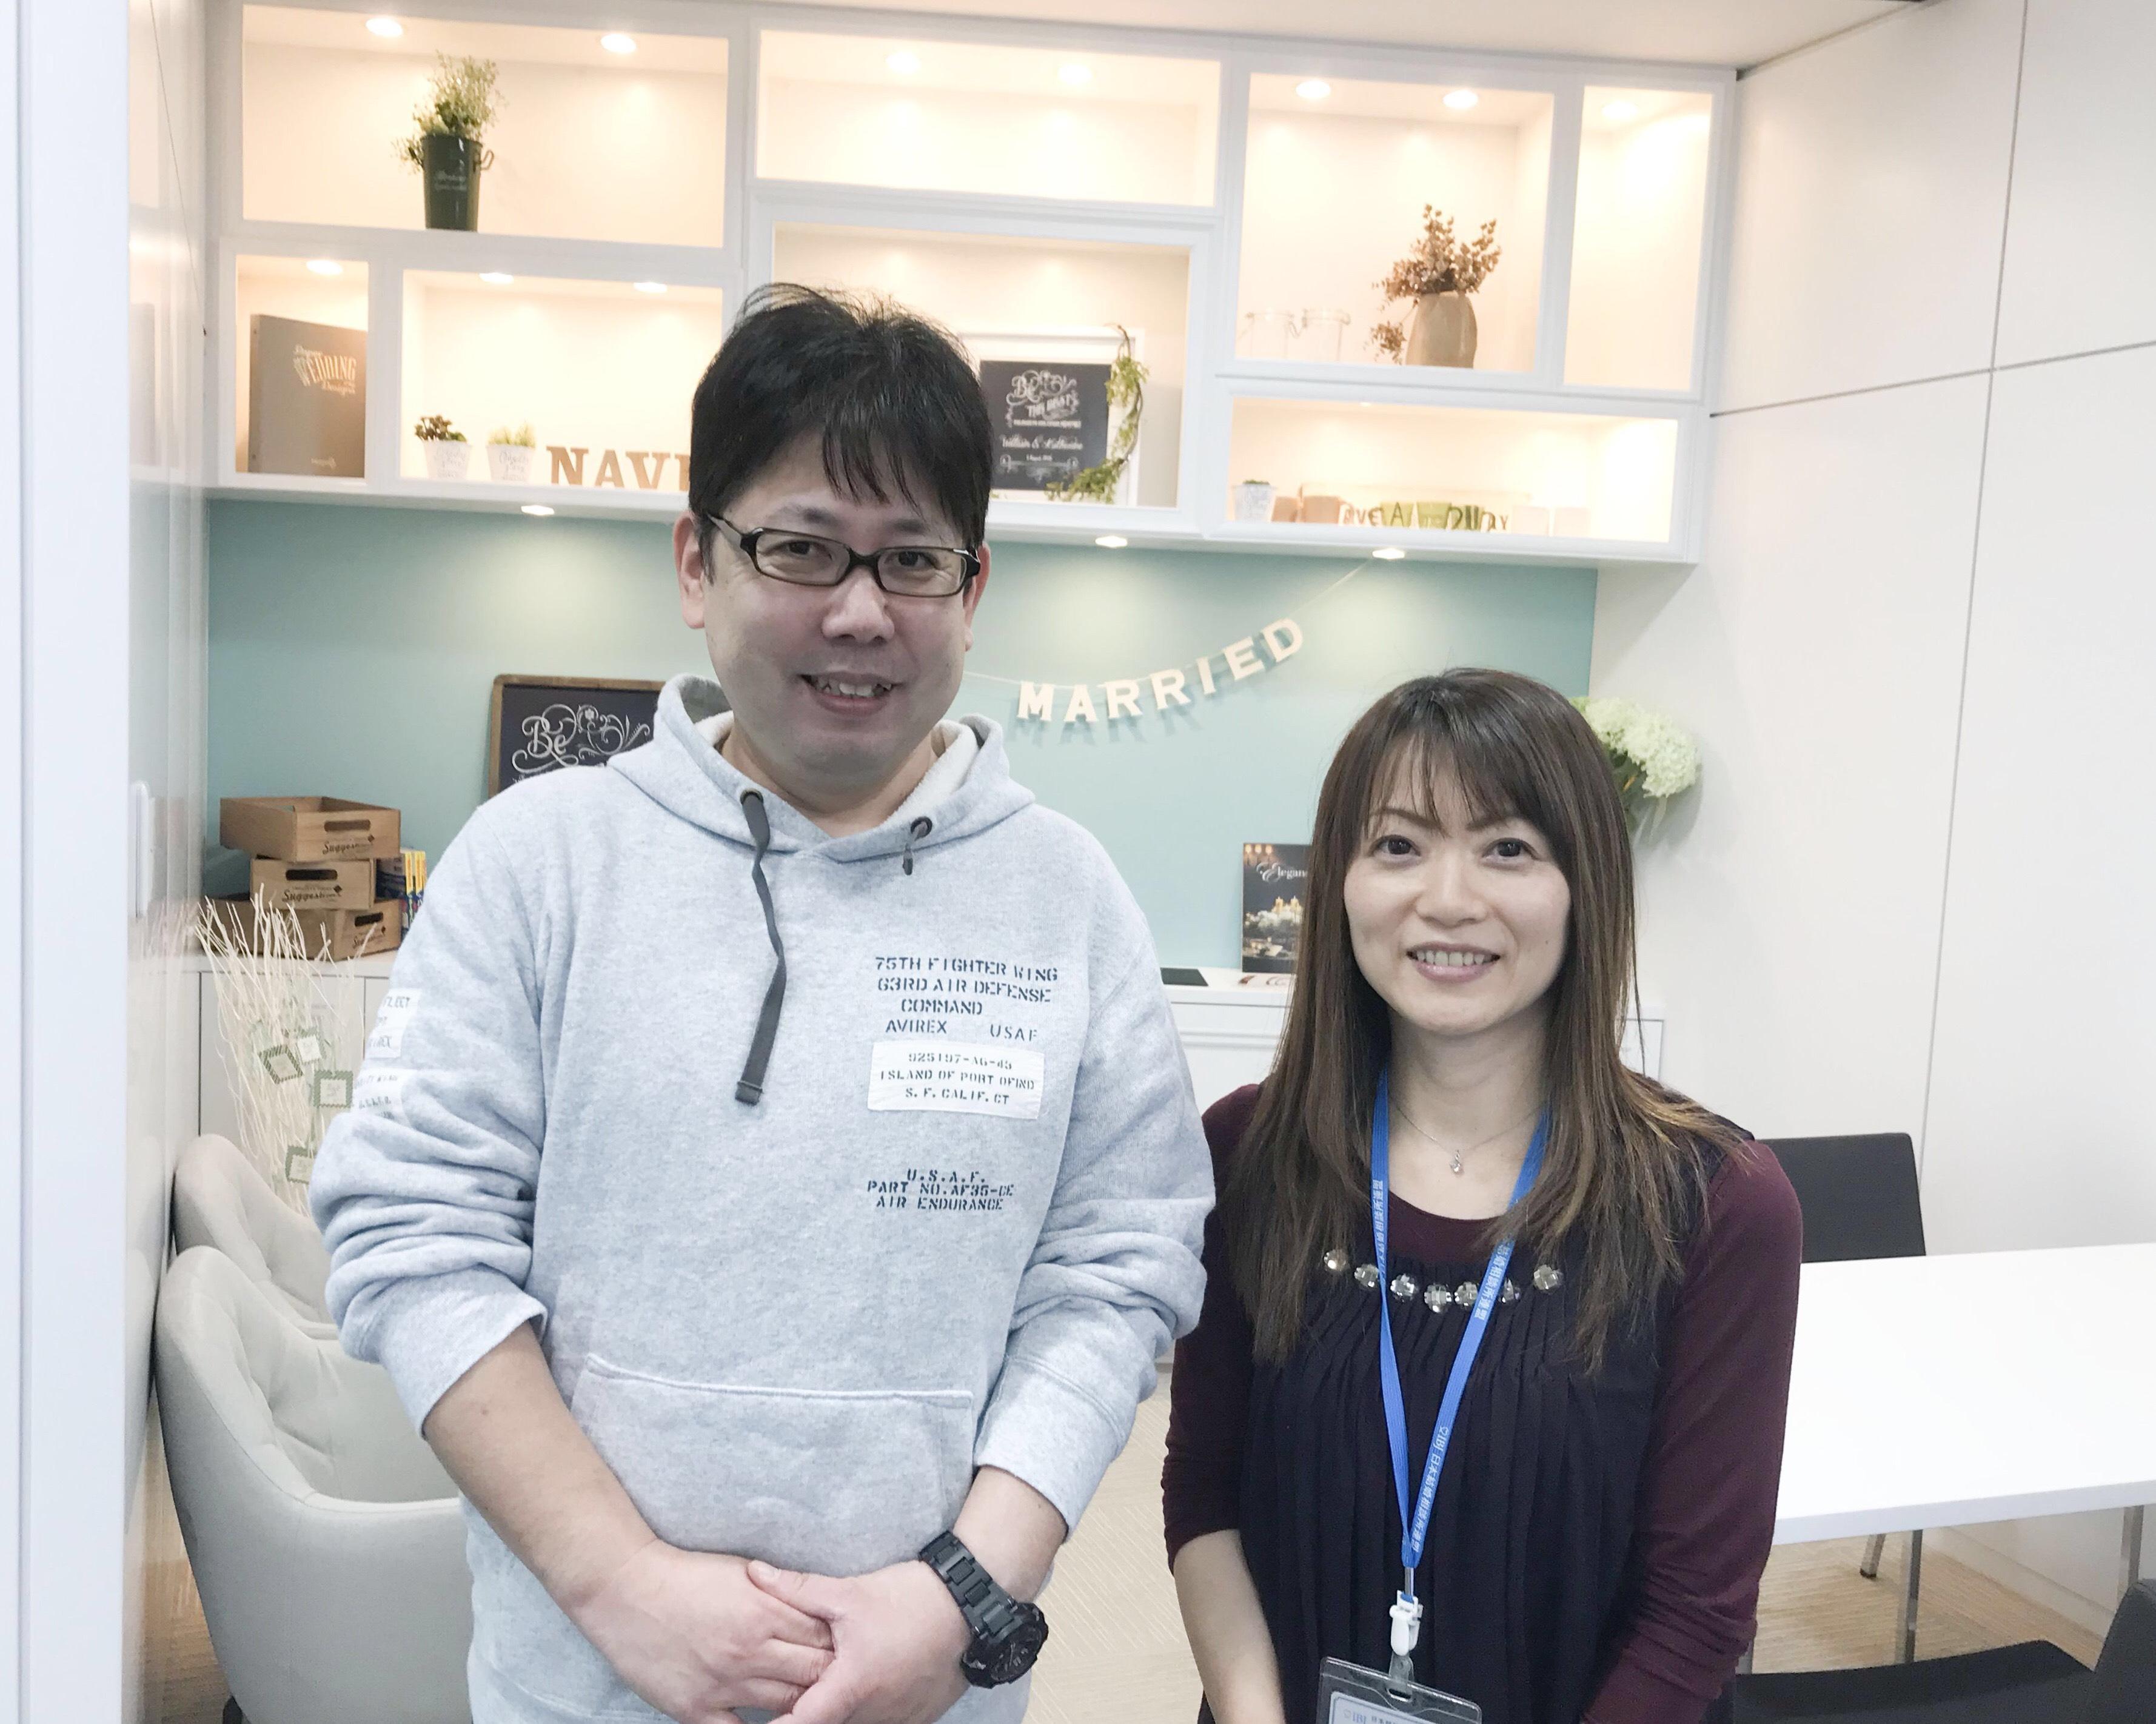 IBJより成婚インタビューを受けました!<br>【ラヴィベル大阪堺 日常ブログ】